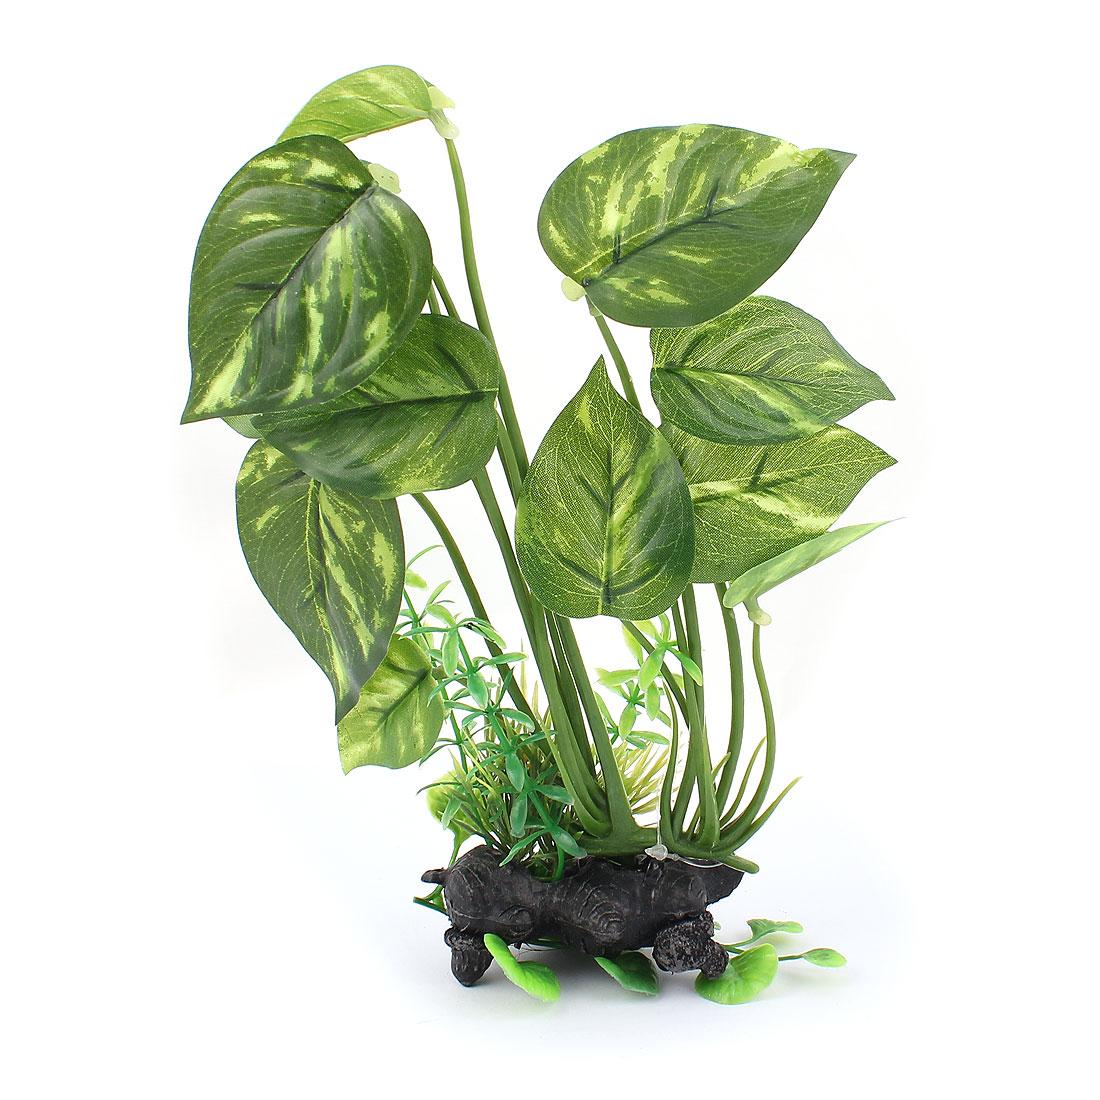 "8.9"" Height Green Plastic Artificial Emulational Decor Aquascaping Ceramic Base Underwater Leaf Grass Plant for Aquarium Fishbowl"